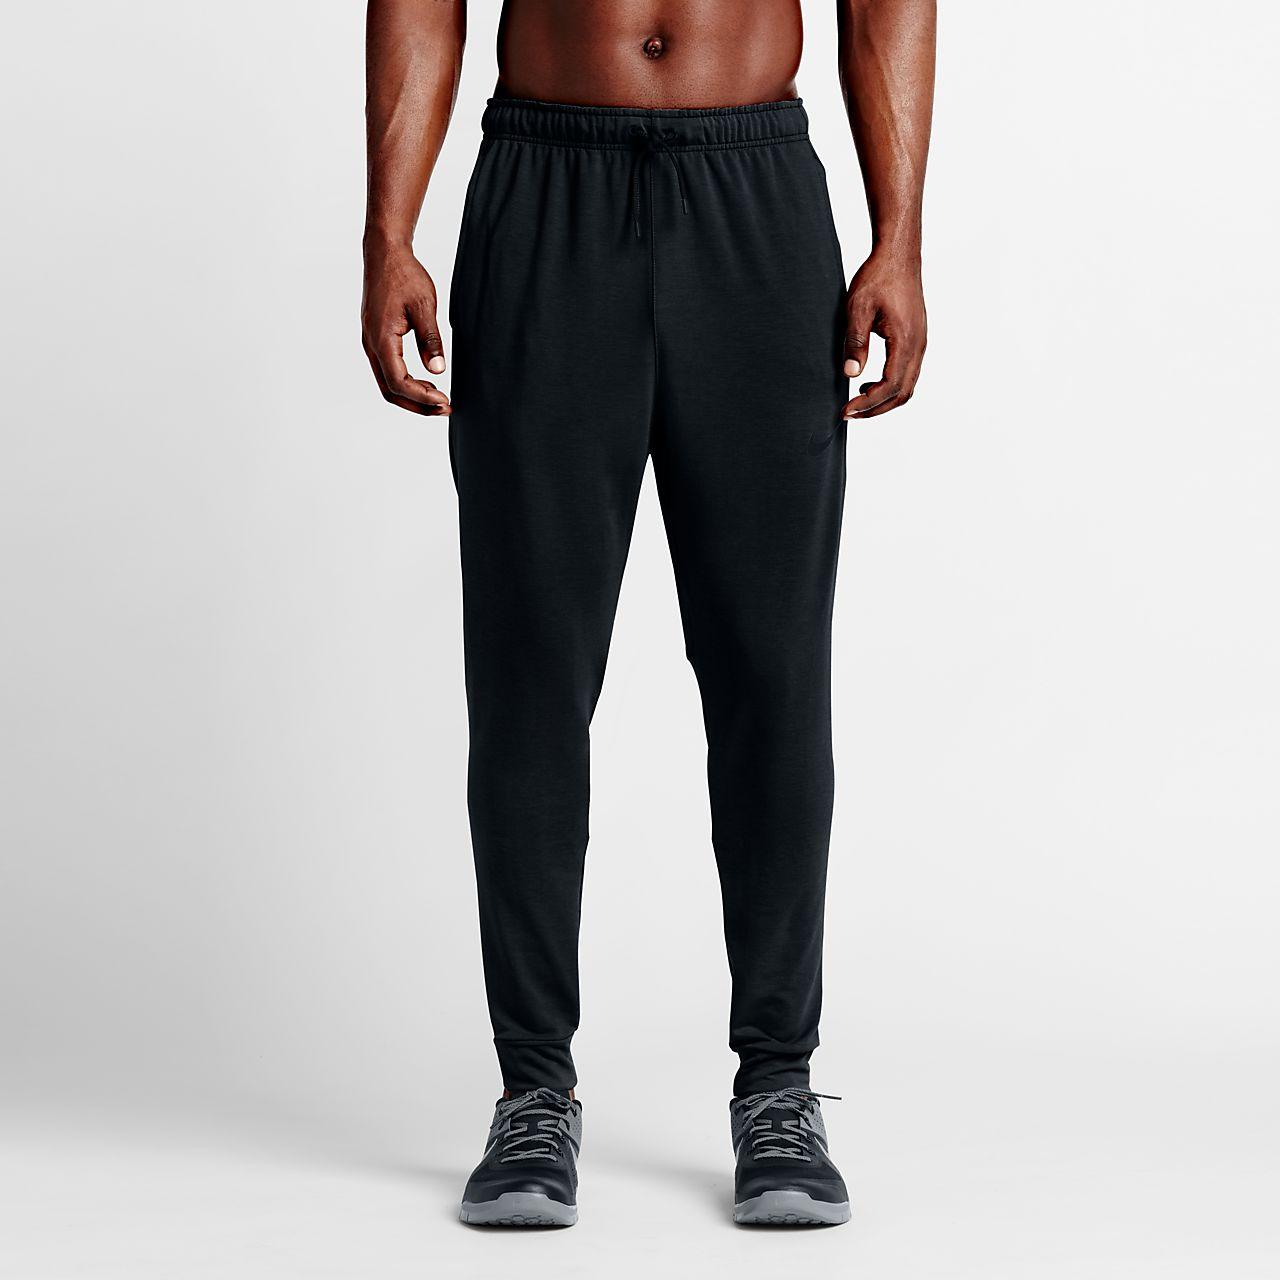 29ca54a509be Nike Dri-FIT Men s Fleece Training Trousers. Nike.com CA